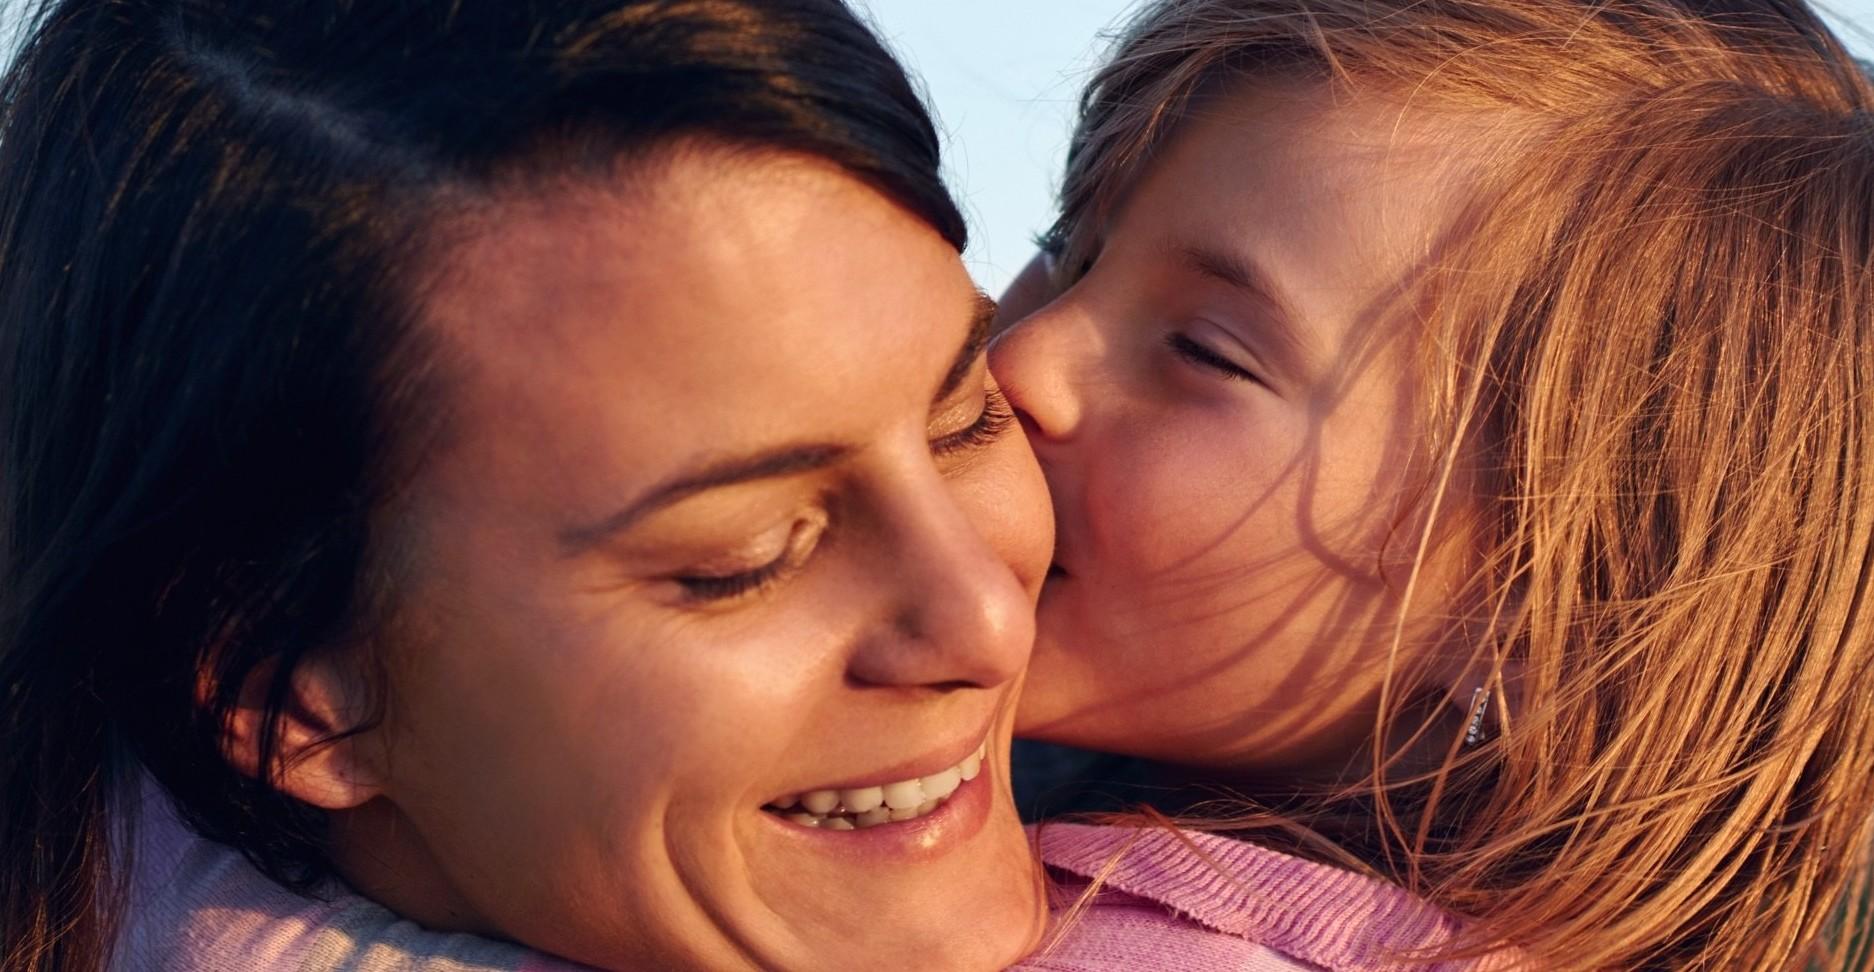 Parent reaction can affect kids' pain